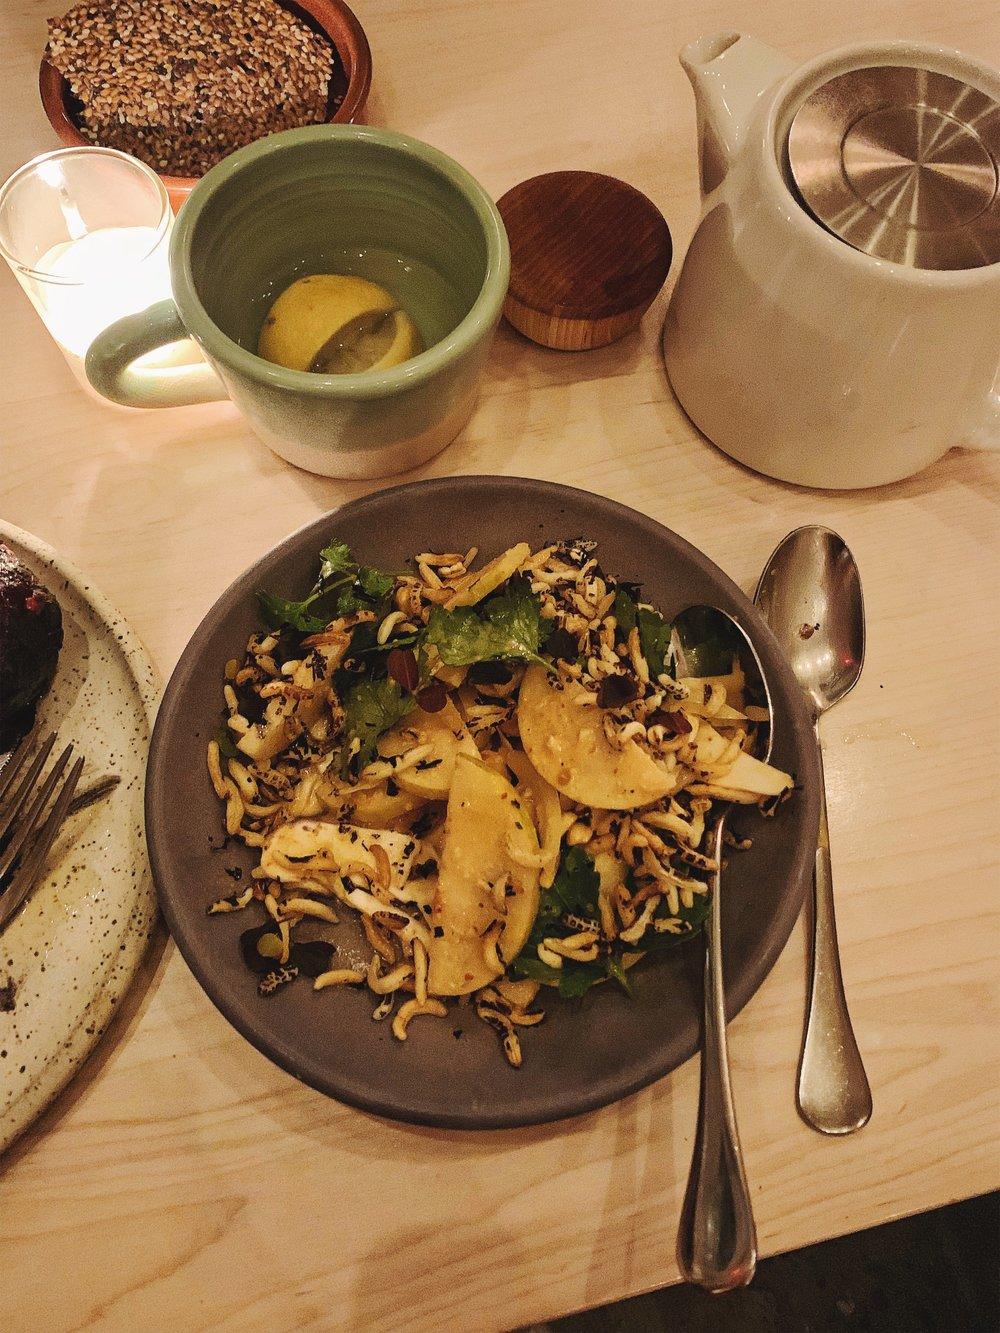 Puffed rice, mushroom and pear salad with herbs at Tusk